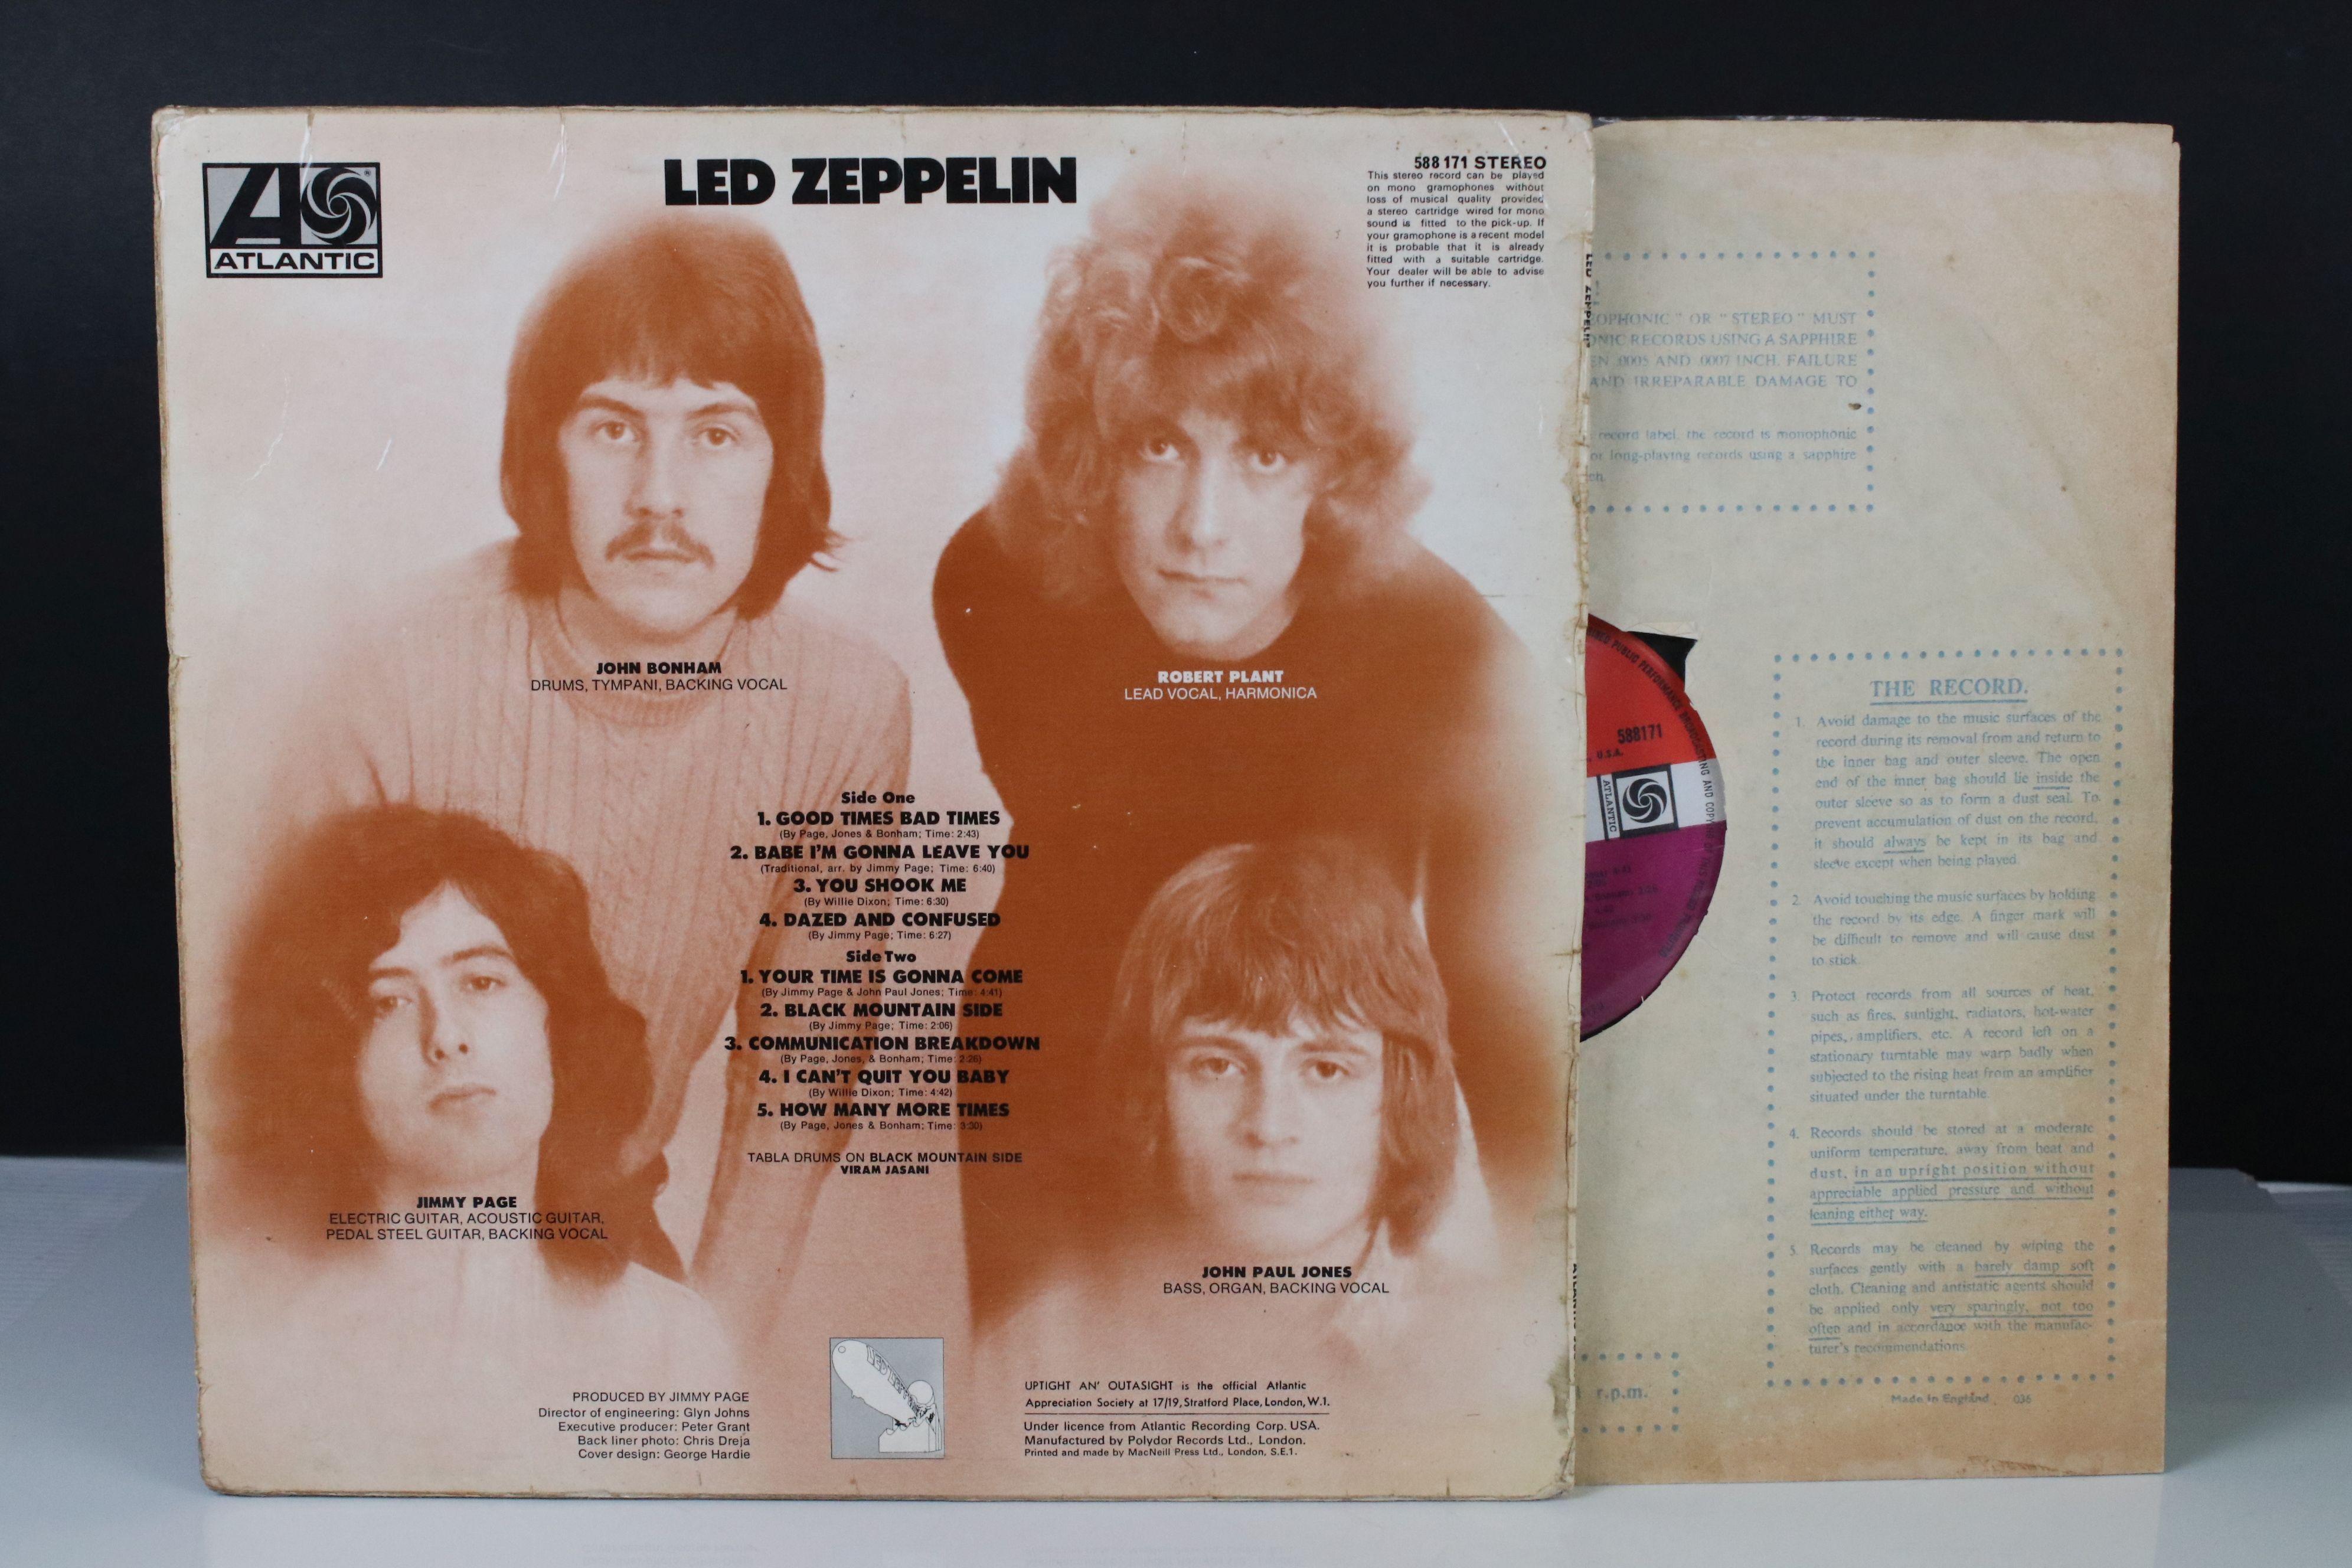 Vinyl - Led Zeppelin One (588171) Atlantic red/maroon label, Superhype publishing credit, - Image 5 of 5